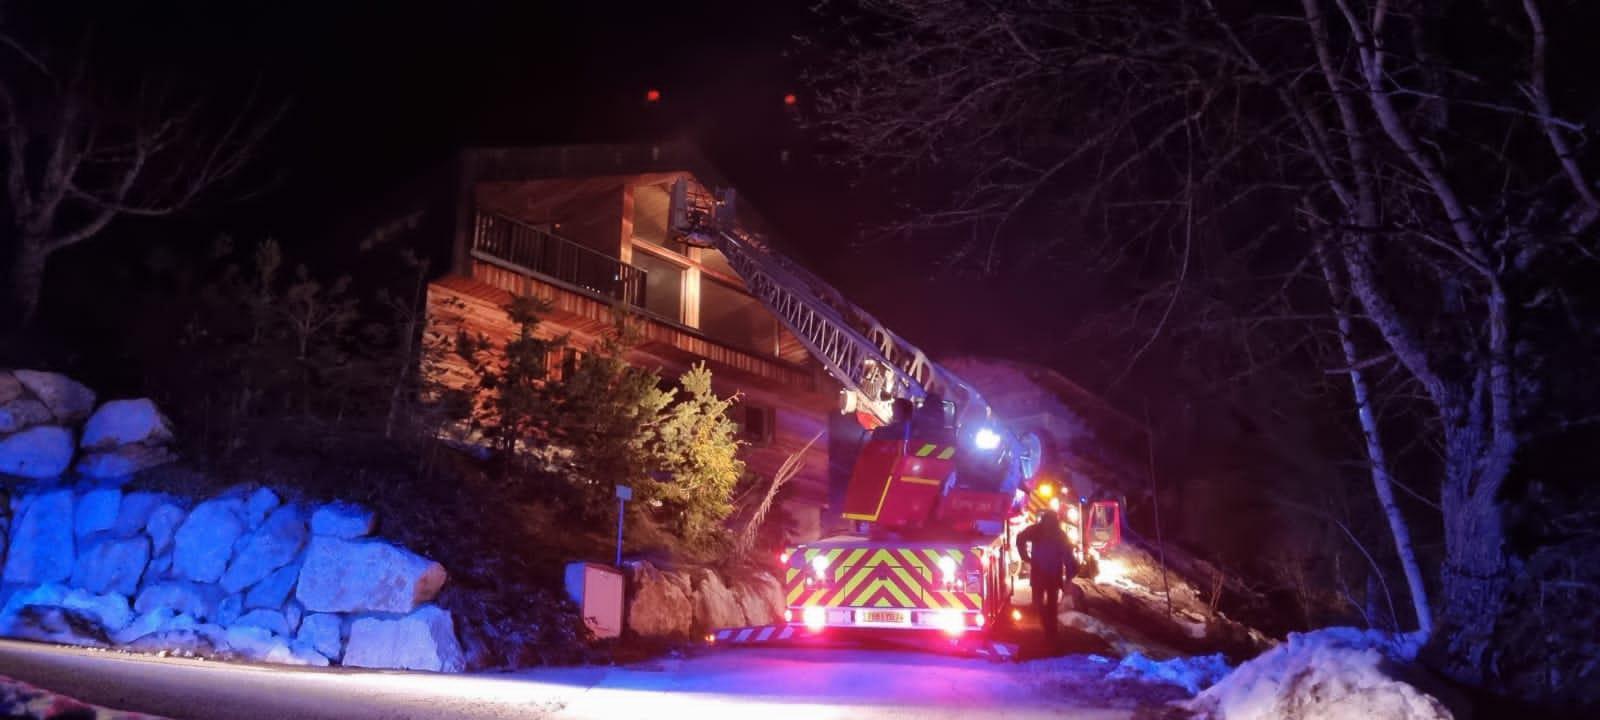 Manigod: un sauna prend feu dans un chalet